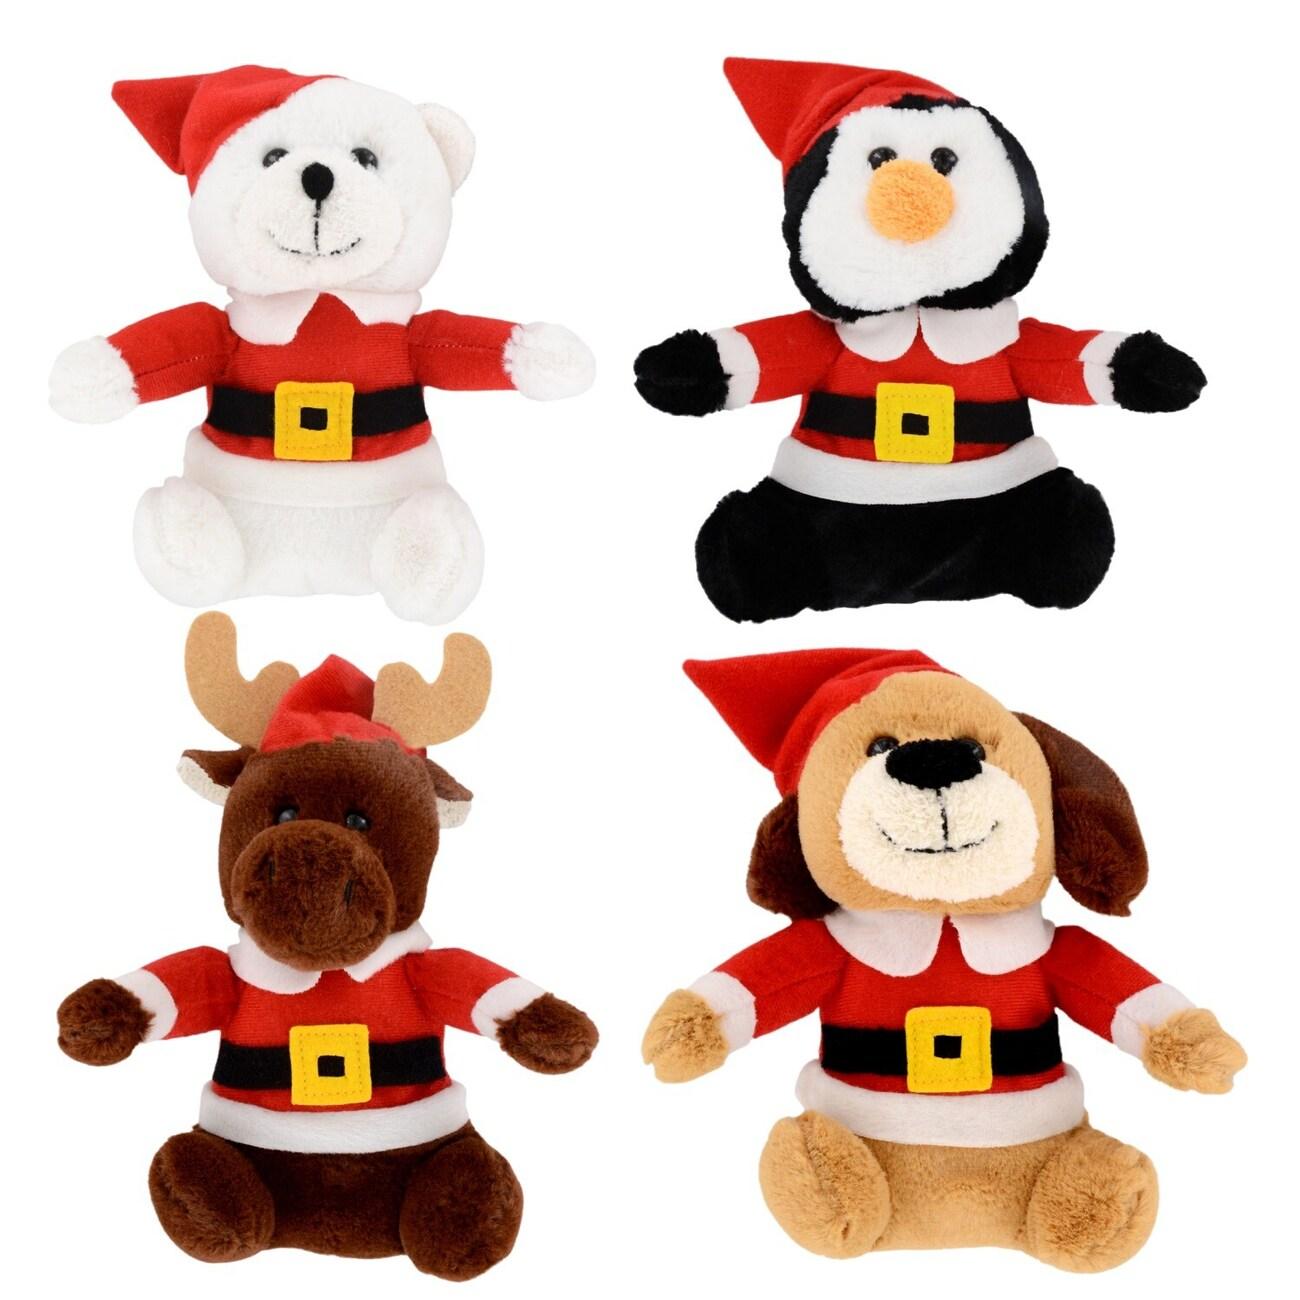 plush christmas friends 65 in - Christmas Plush Toys